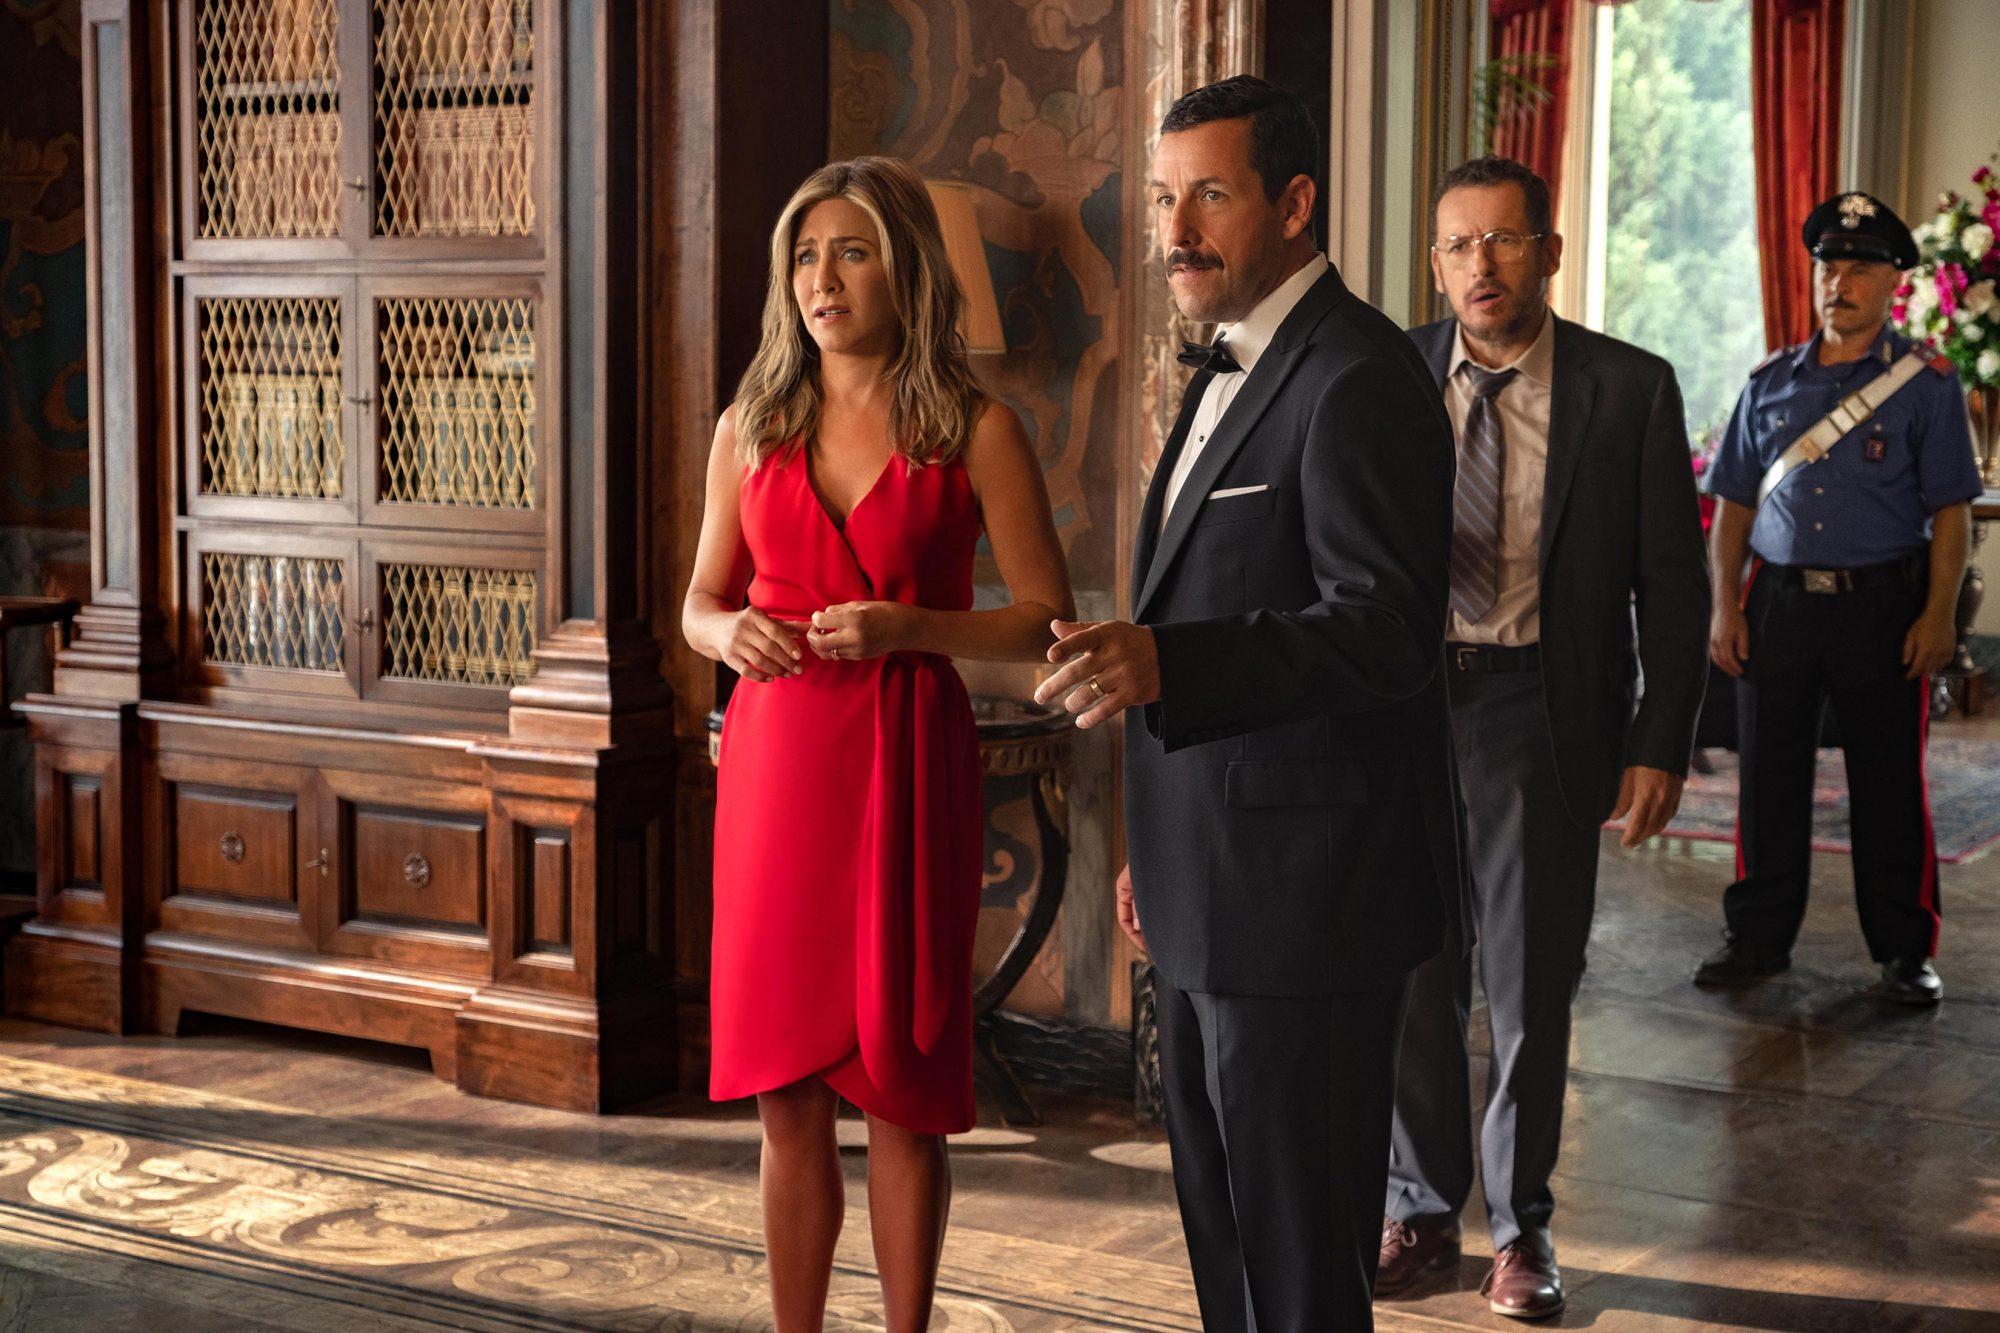 Murder Mystery review: Netflix film stars Jennifer Aniston, Adam Sandler |  EW.com